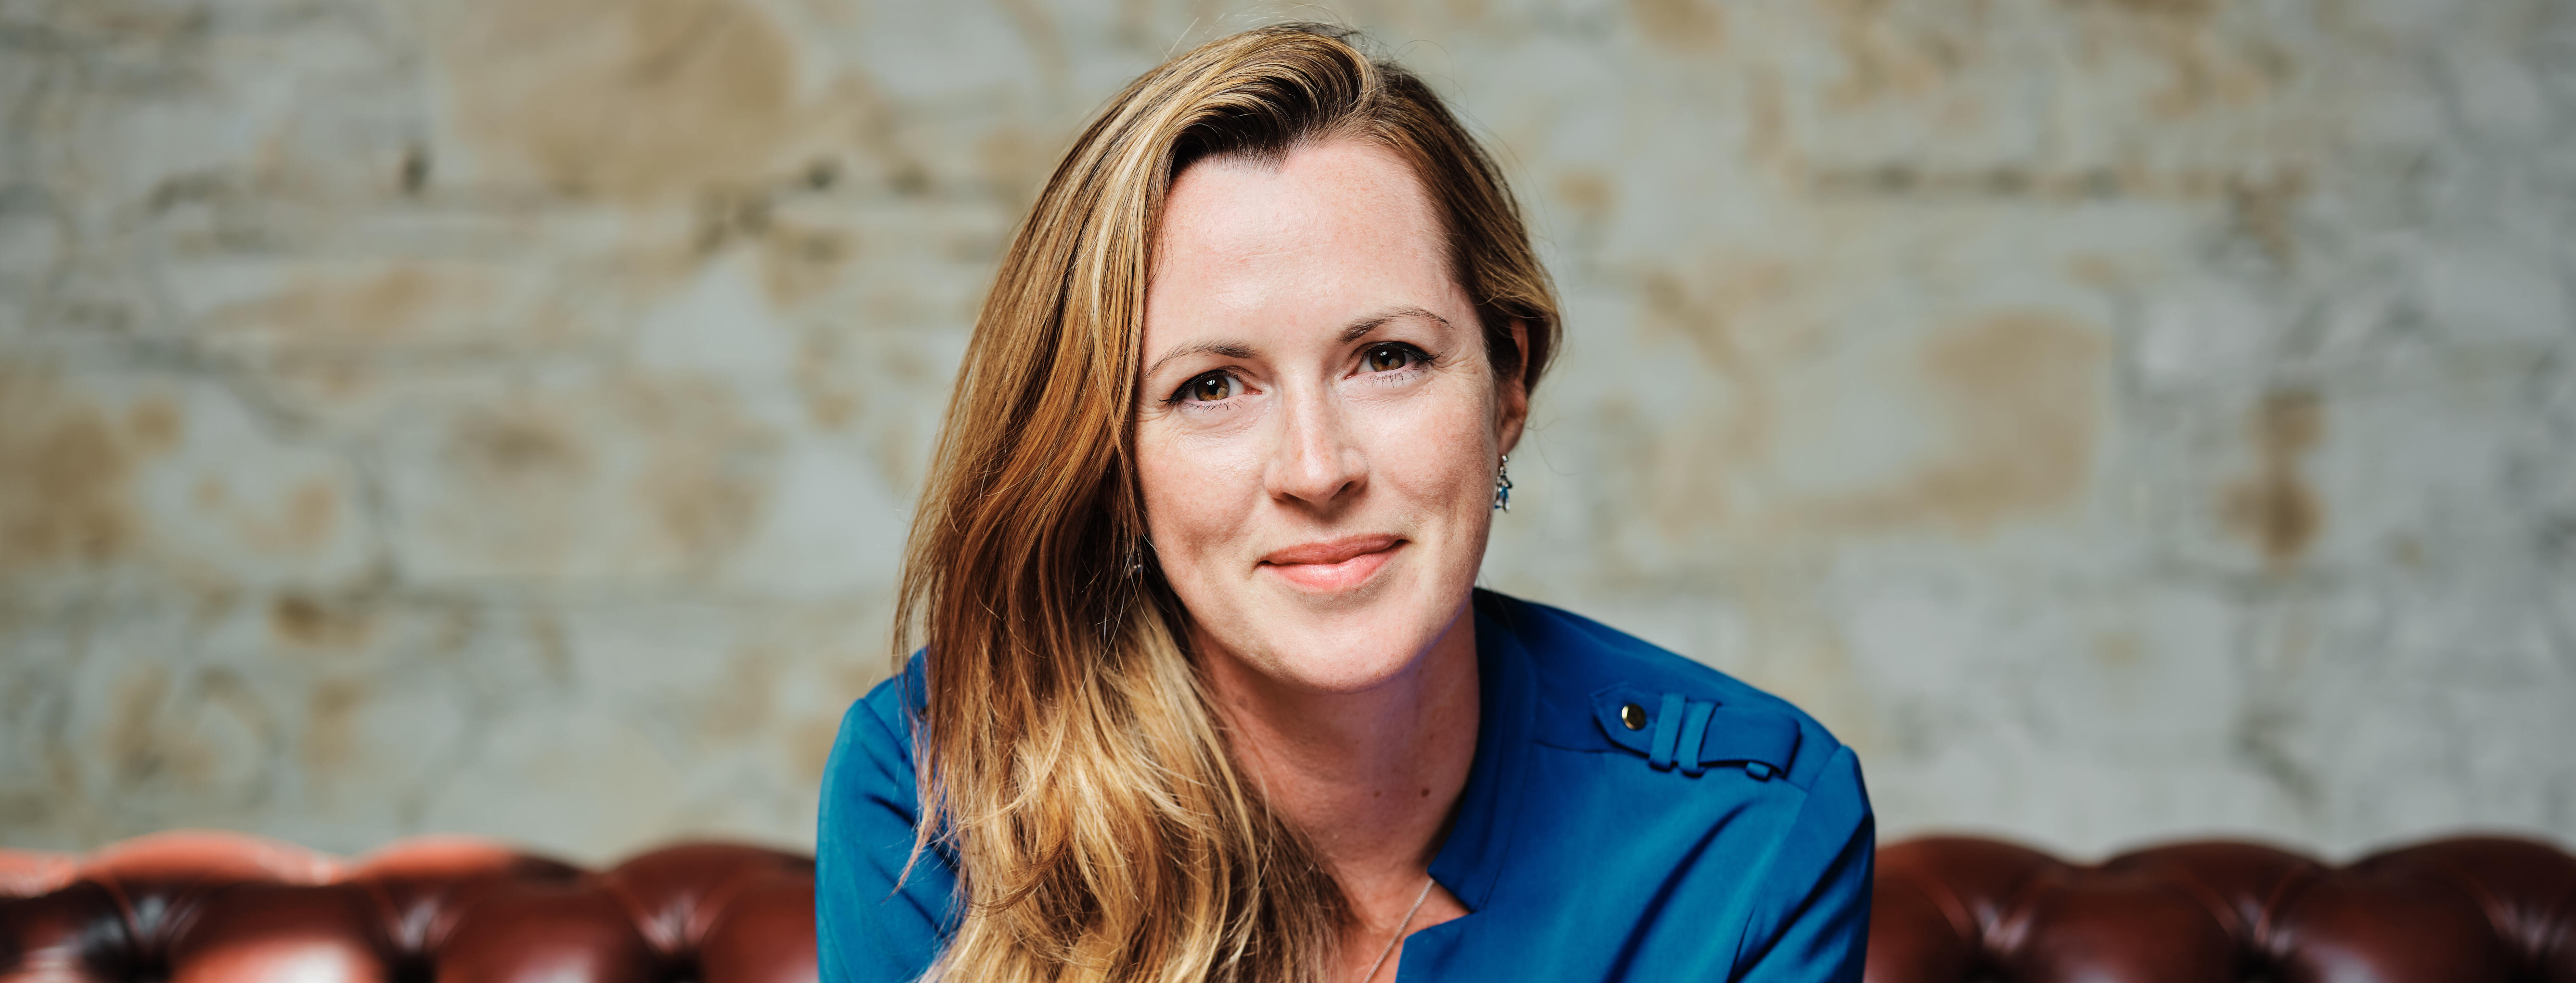 GMA Book Club Picks Sophie Cousens Novel